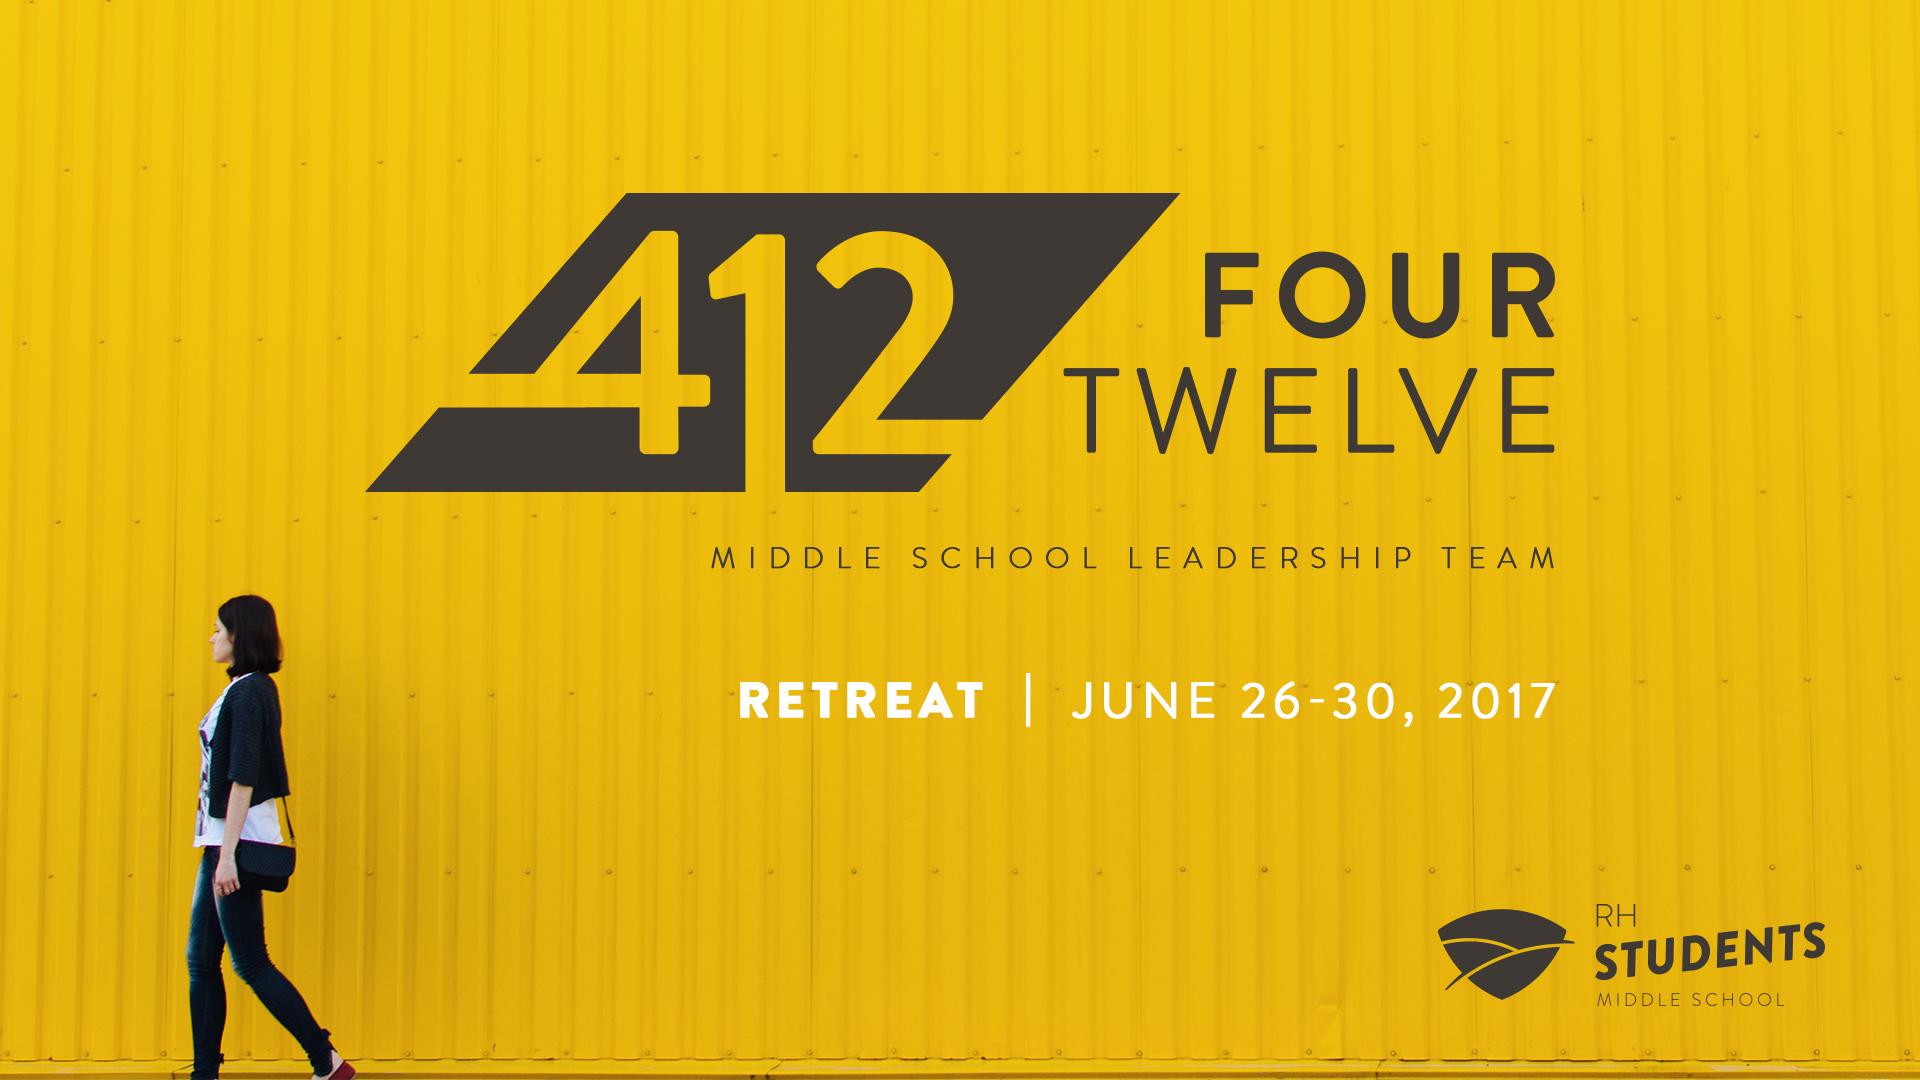 412 2017 tv retreat